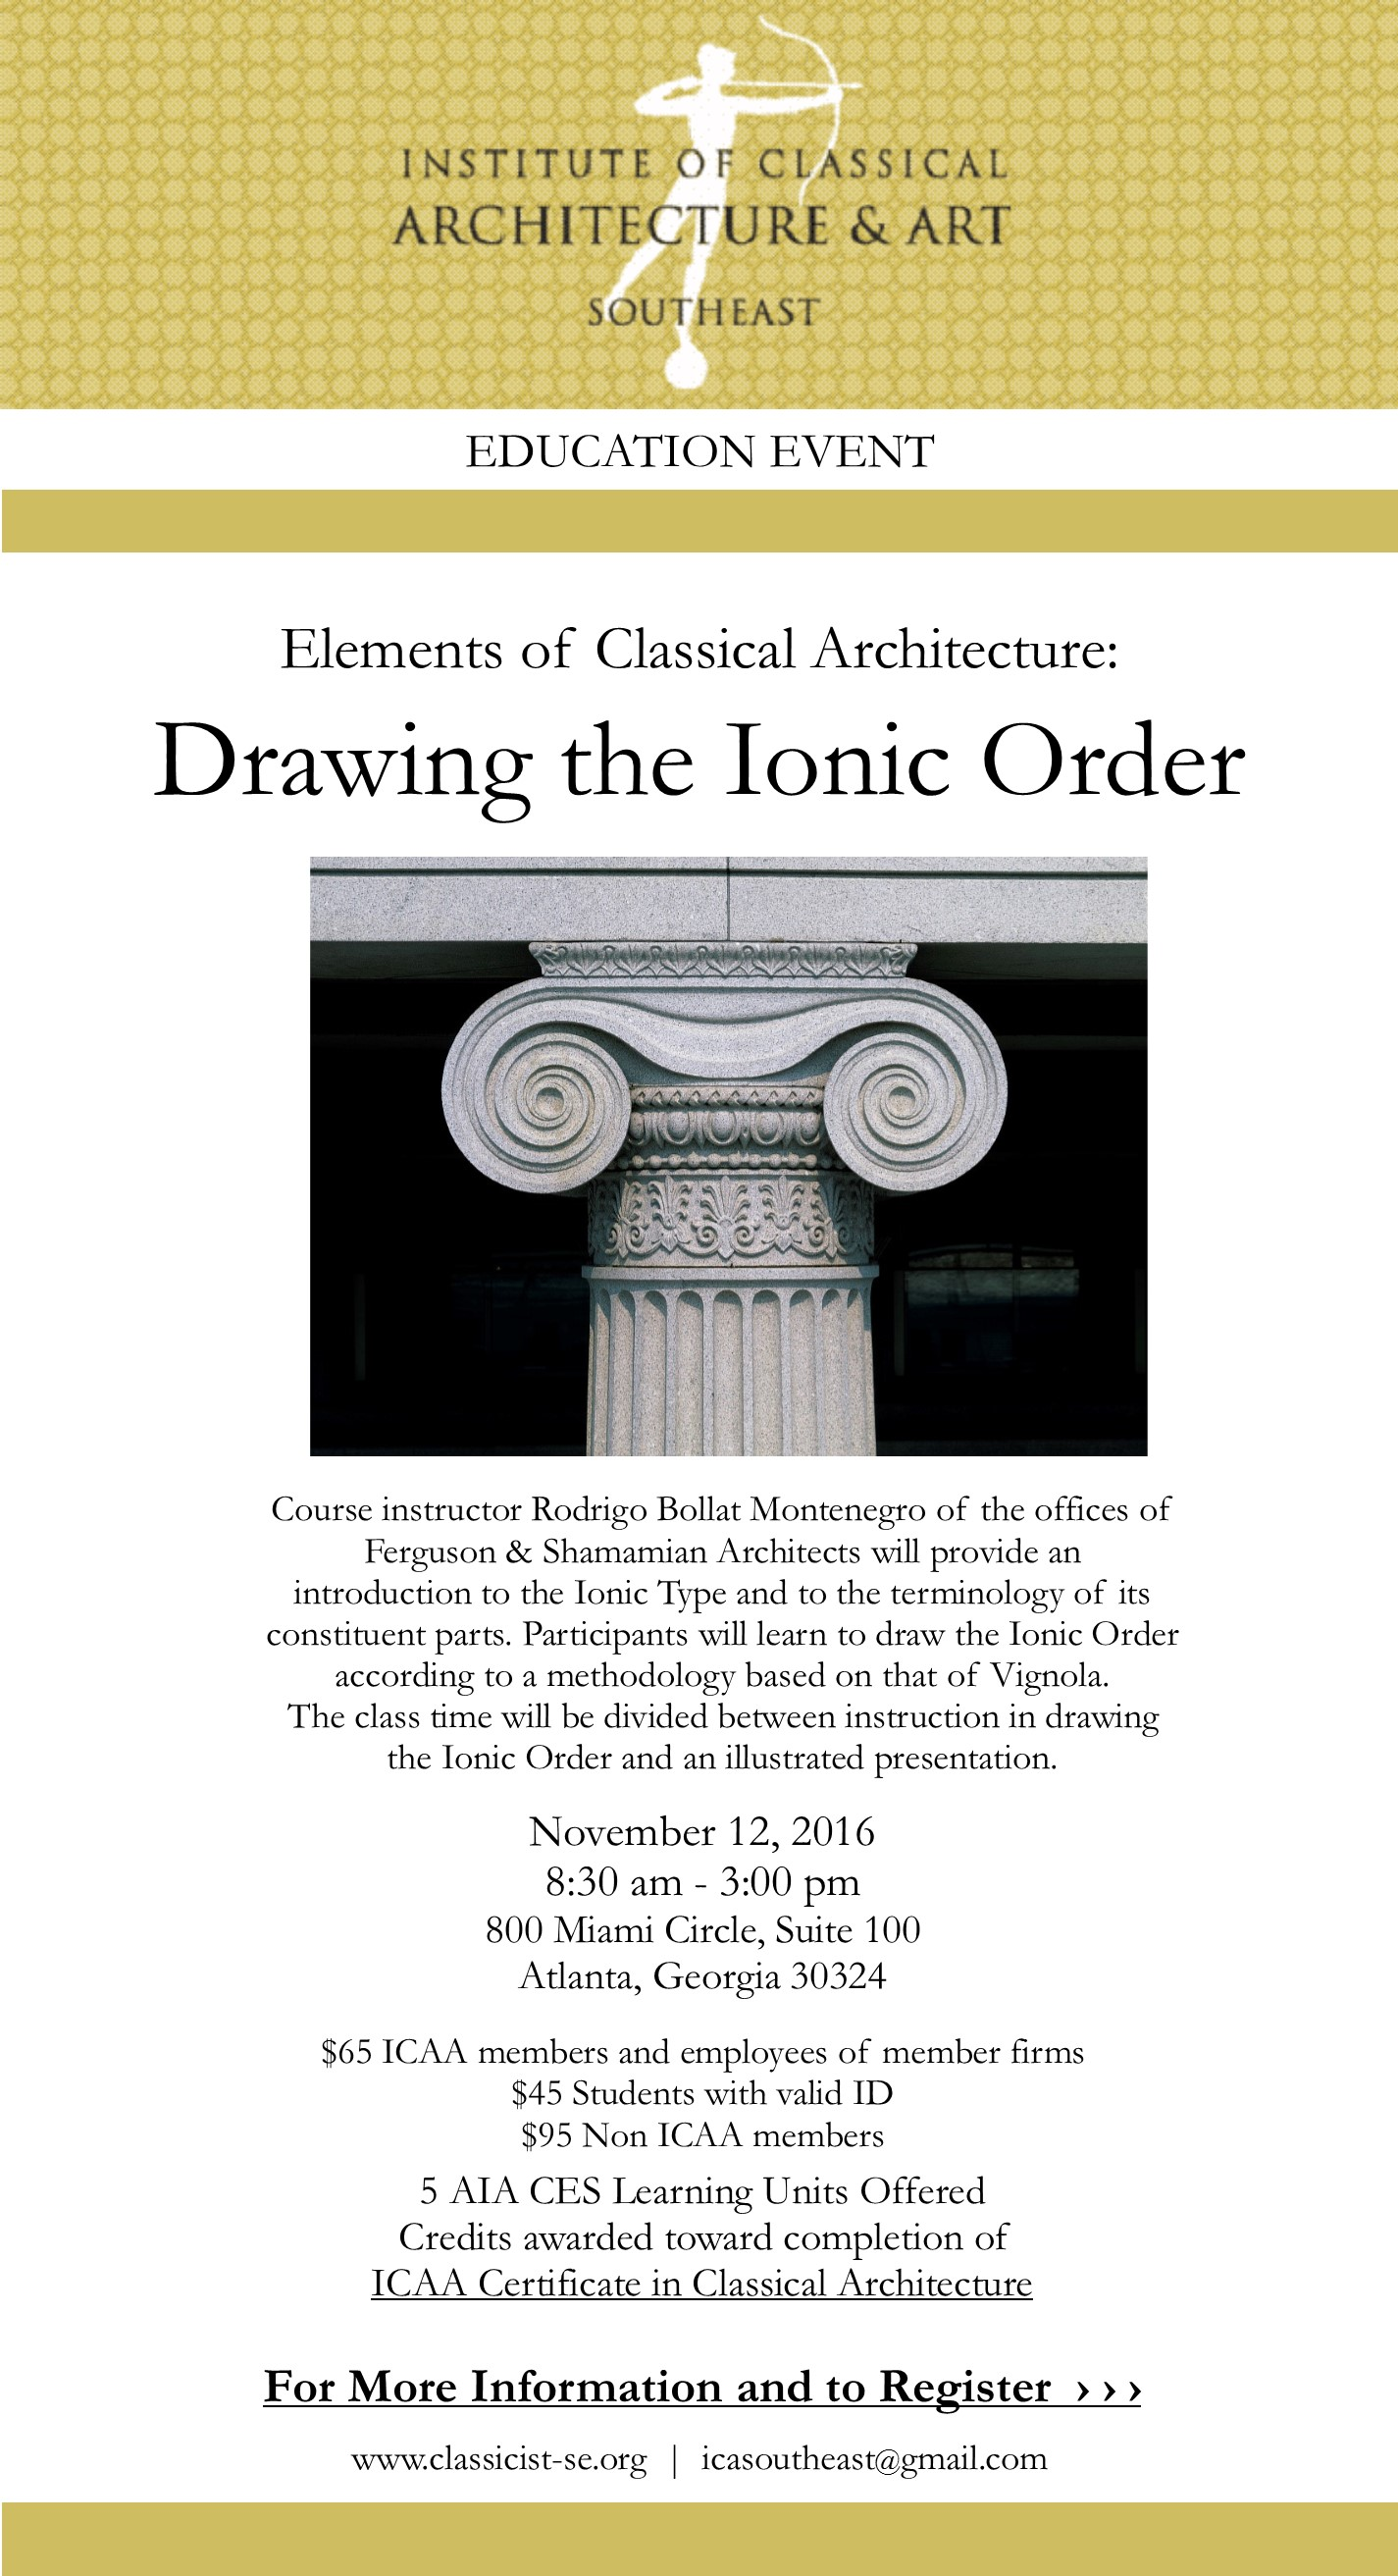 RodrigoM_Ionic Order 11.12.16